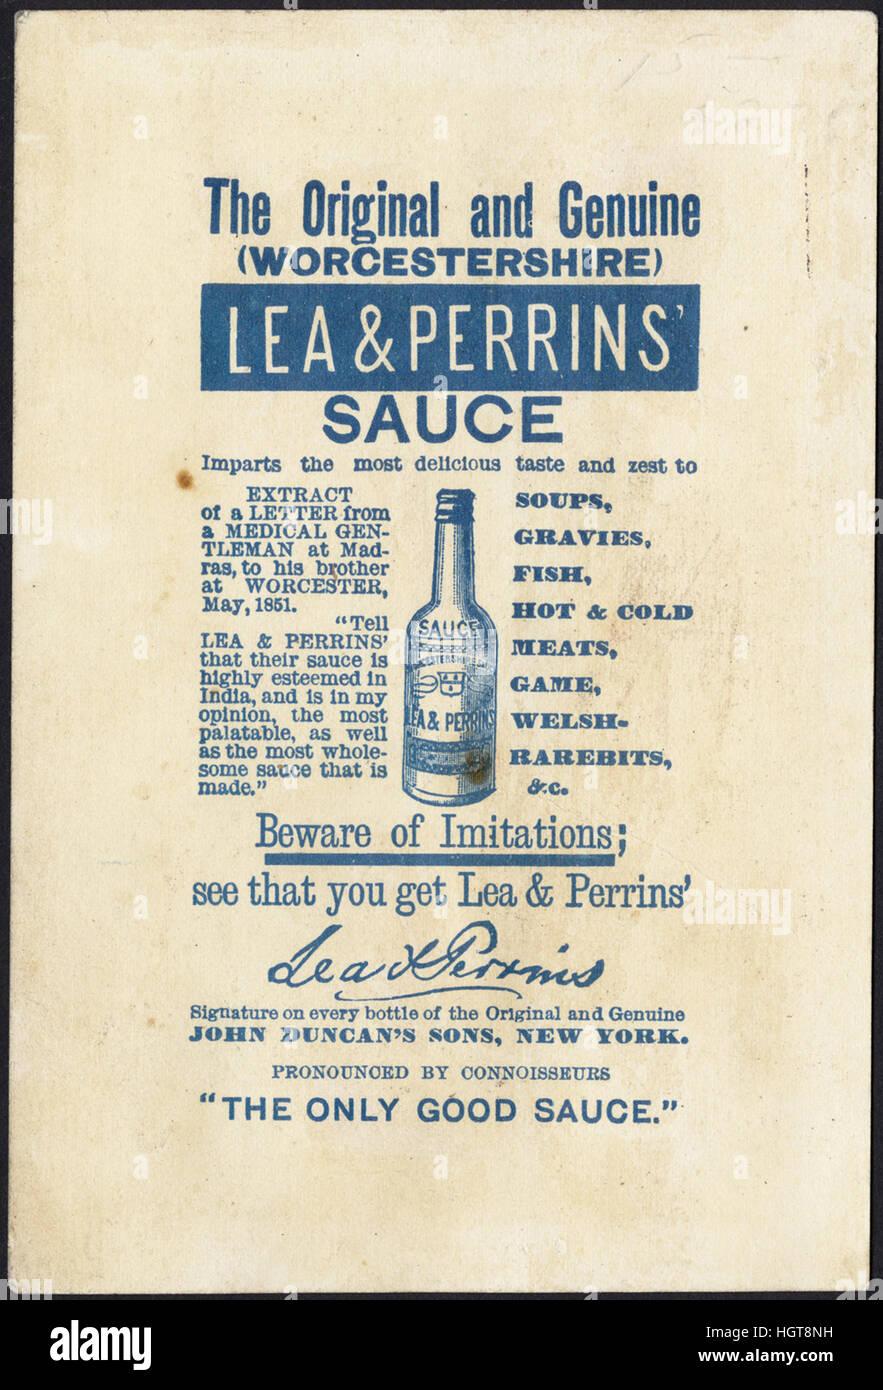 Lea & Perrins' Sauce [back]  - Food Trade Card - Stock Image